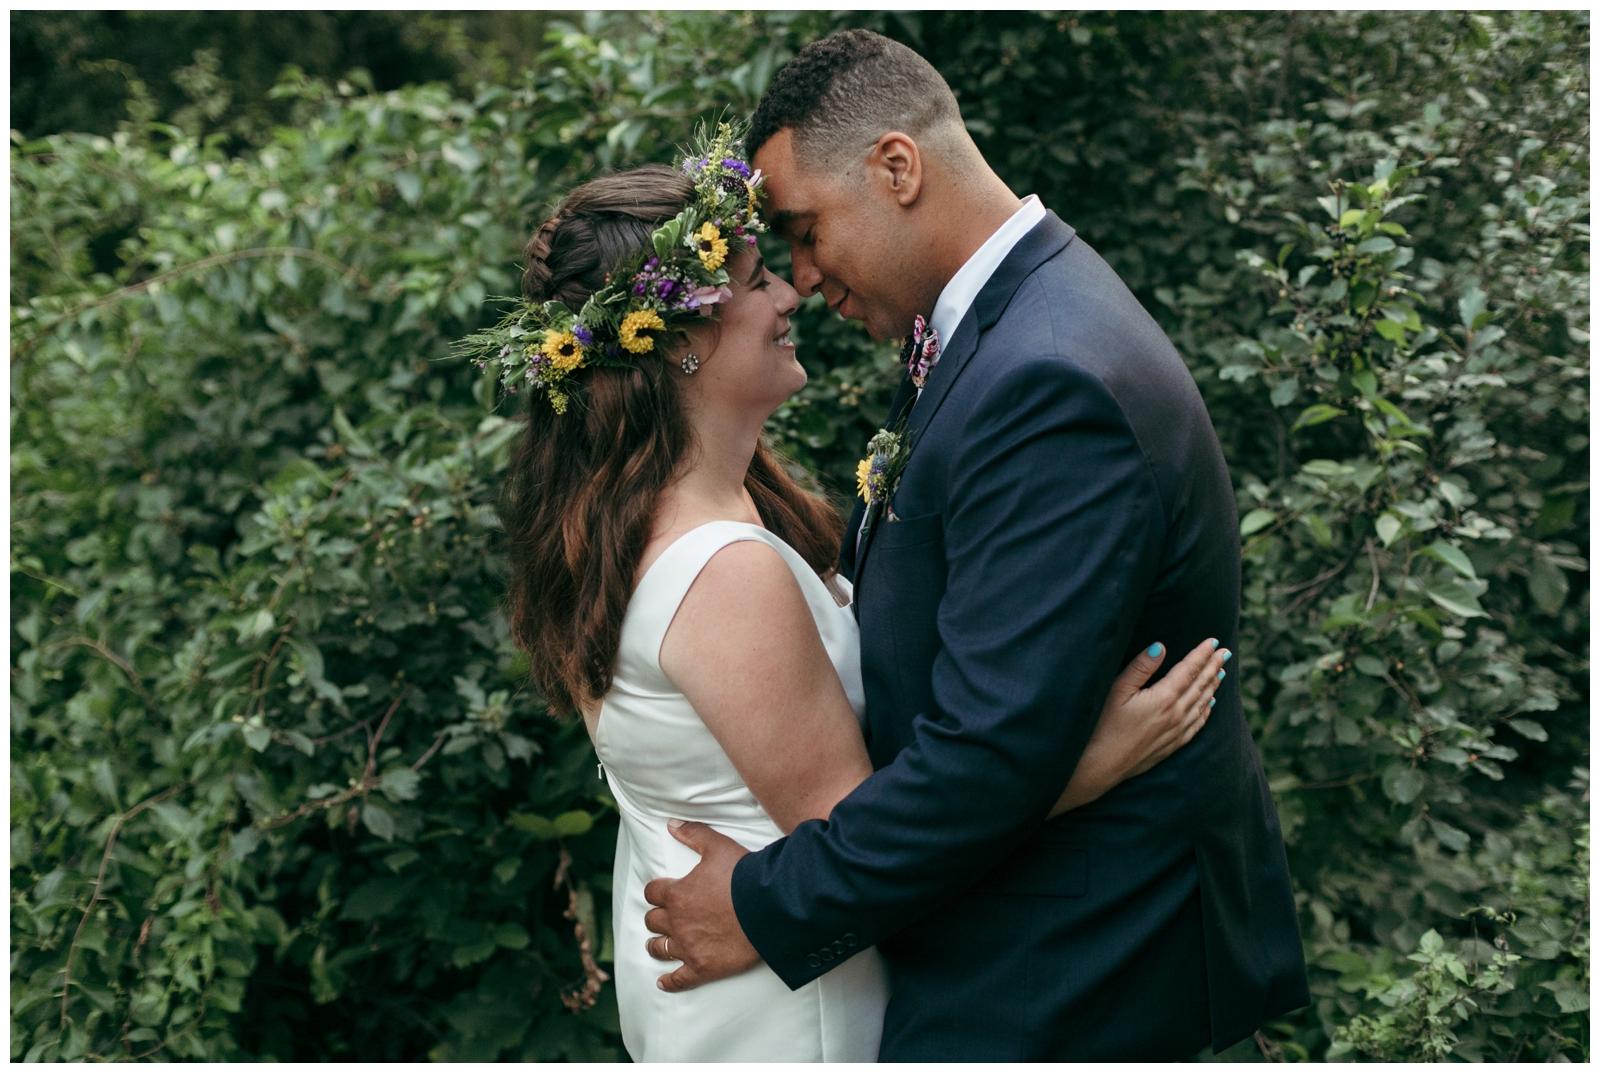 Bailey-Q-Photo-Connors-Center-Wedding-Boston-Wedding-Photographer-096.jpg